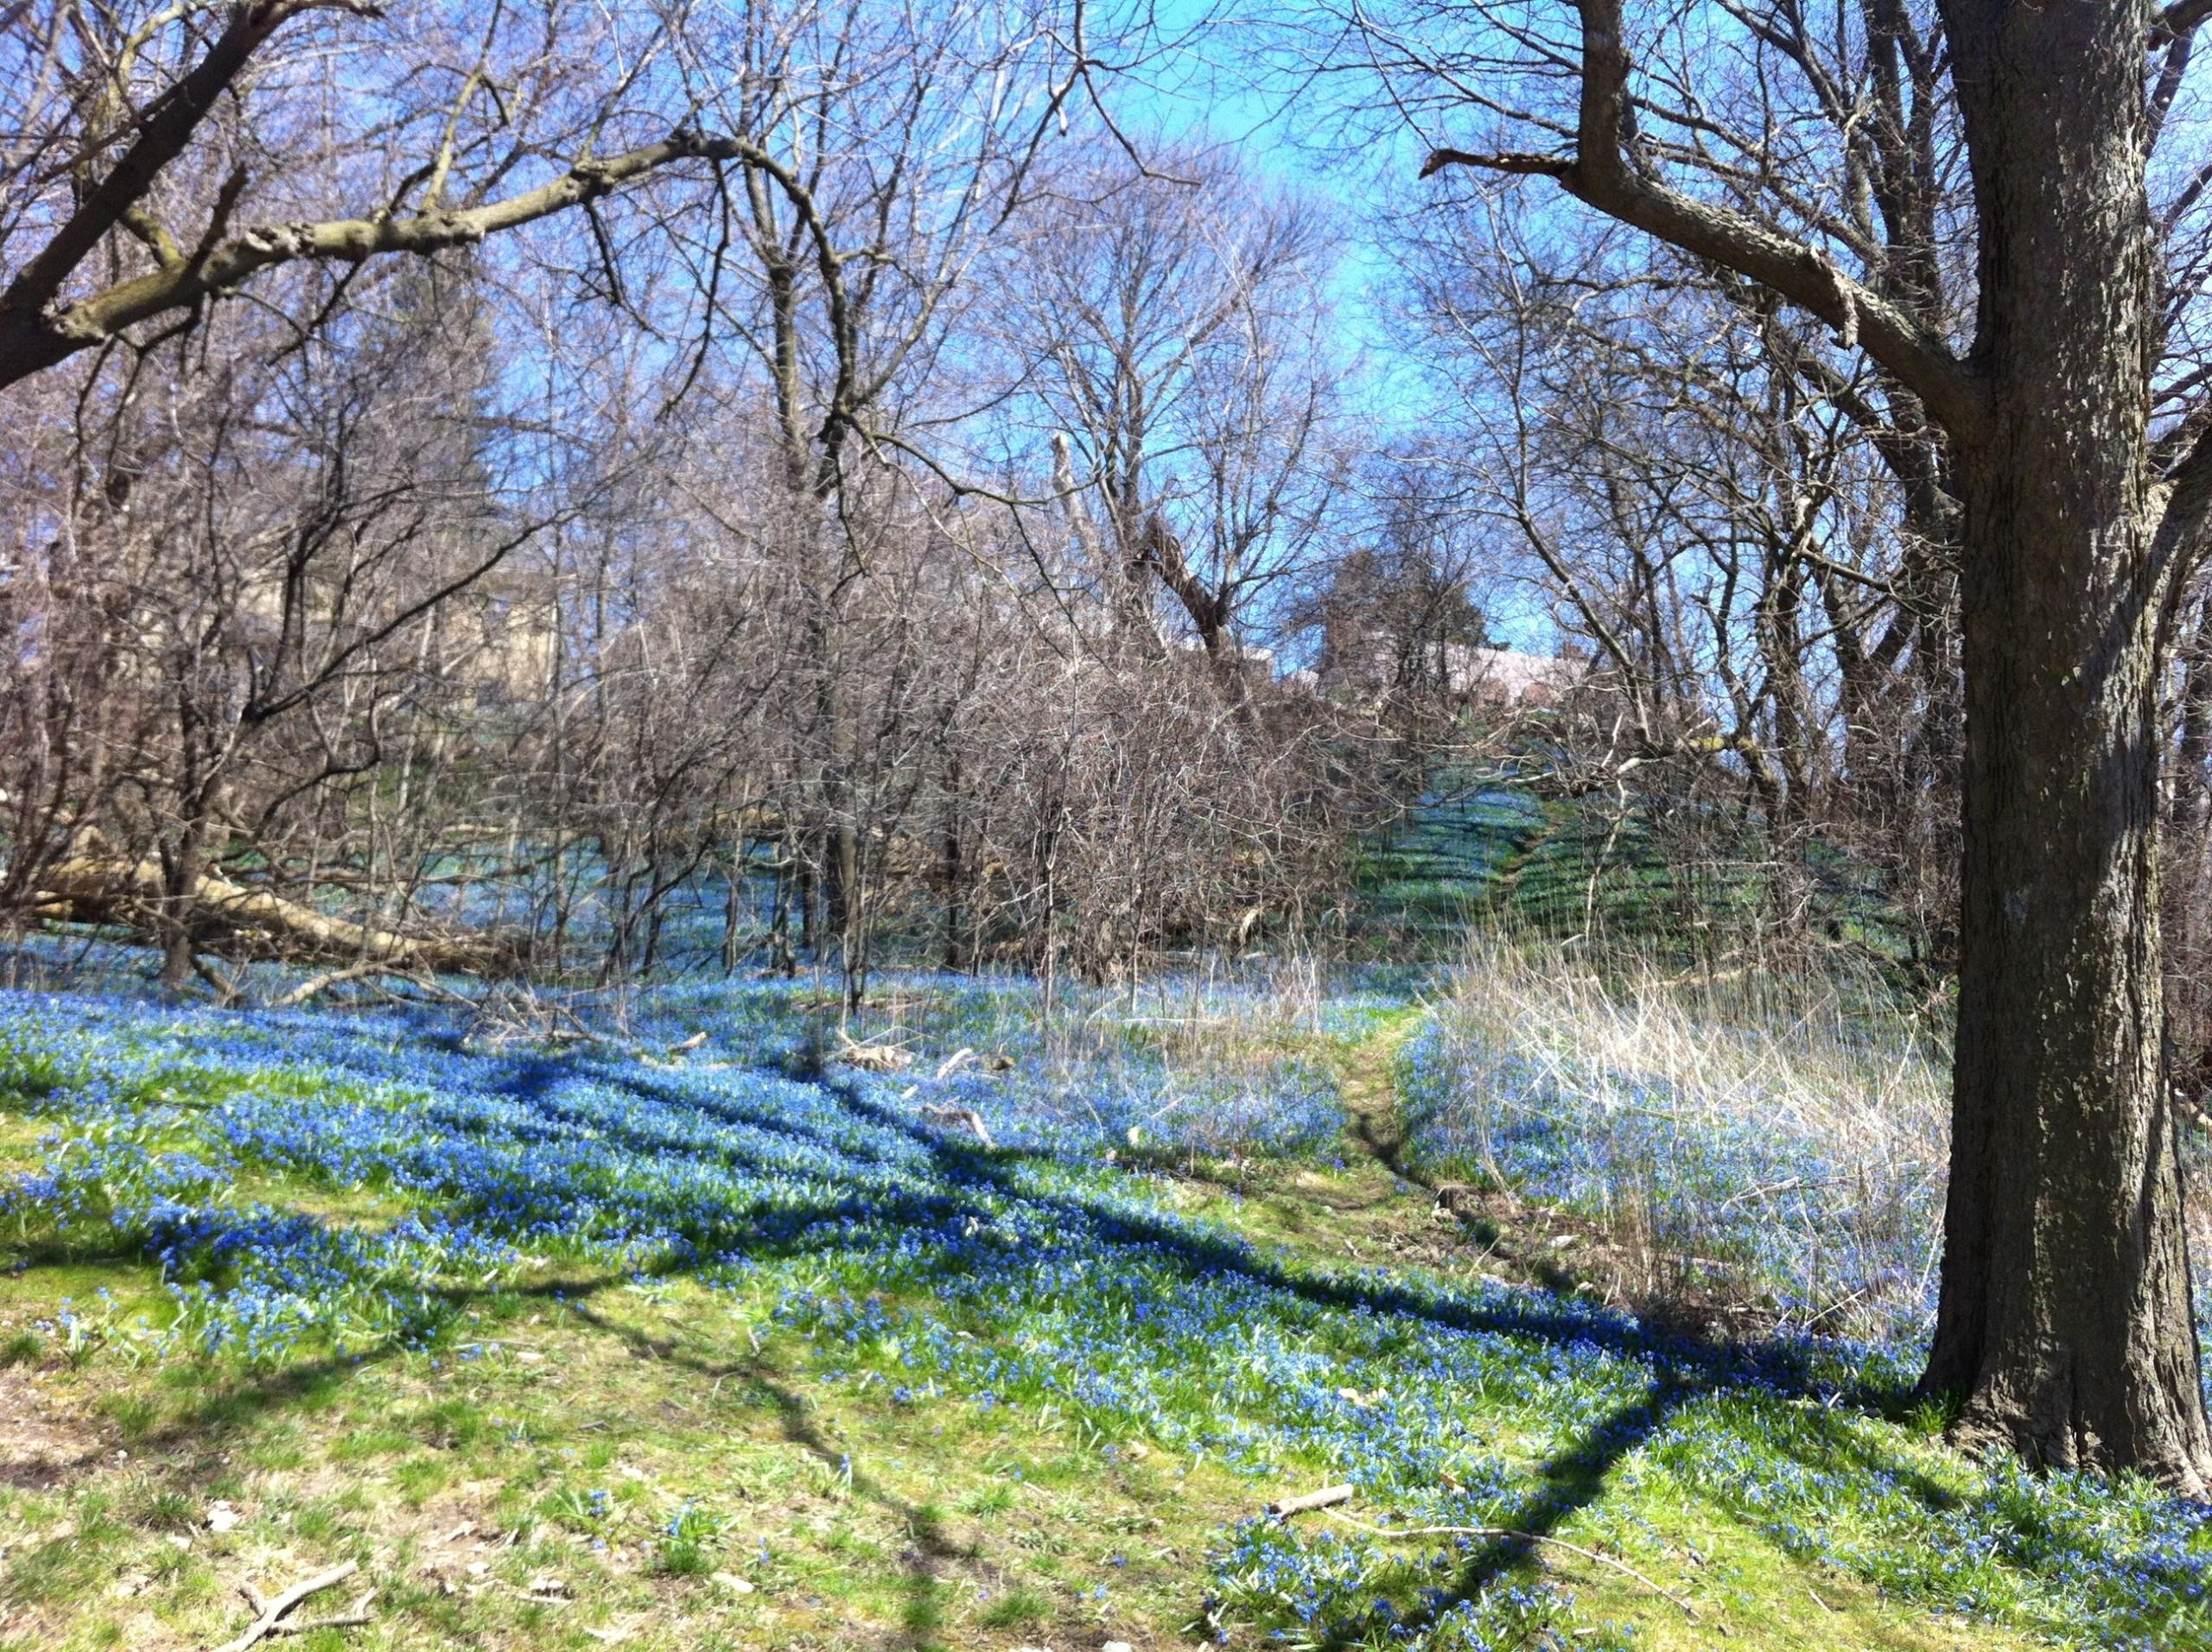 Upcoming Harris Park Renovations